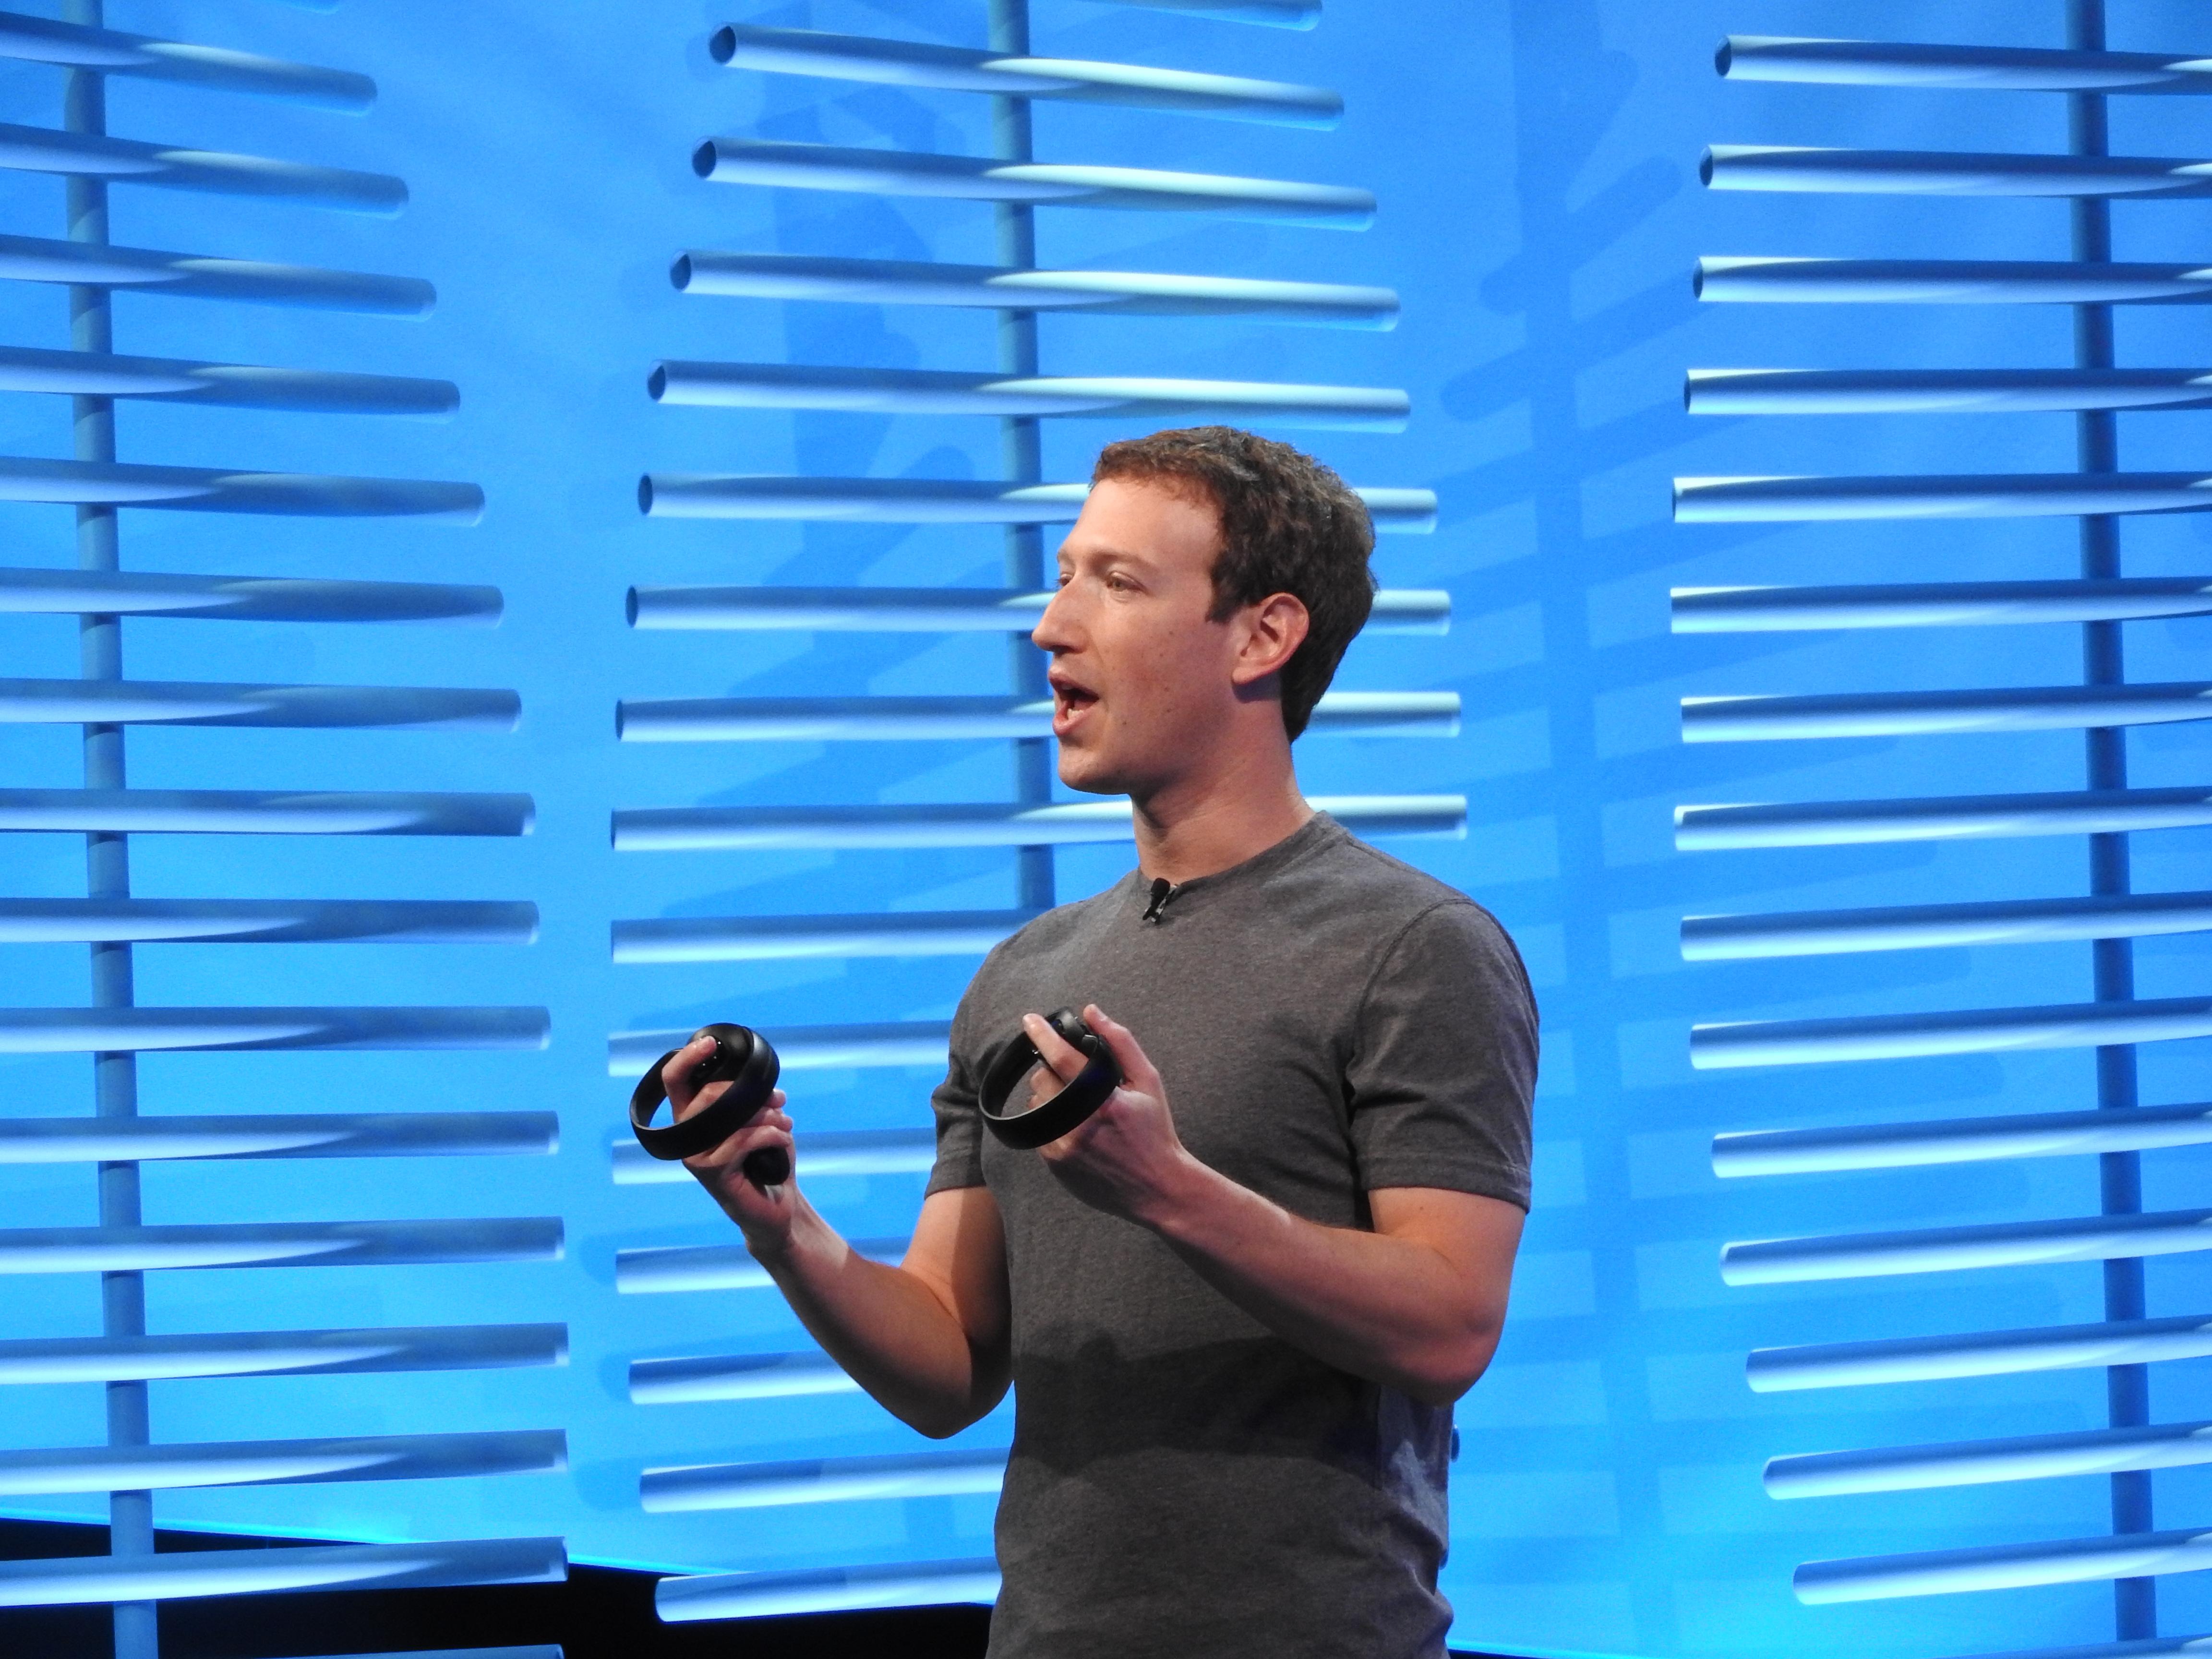 Mark Zuckerberg shows off Oculus Touch